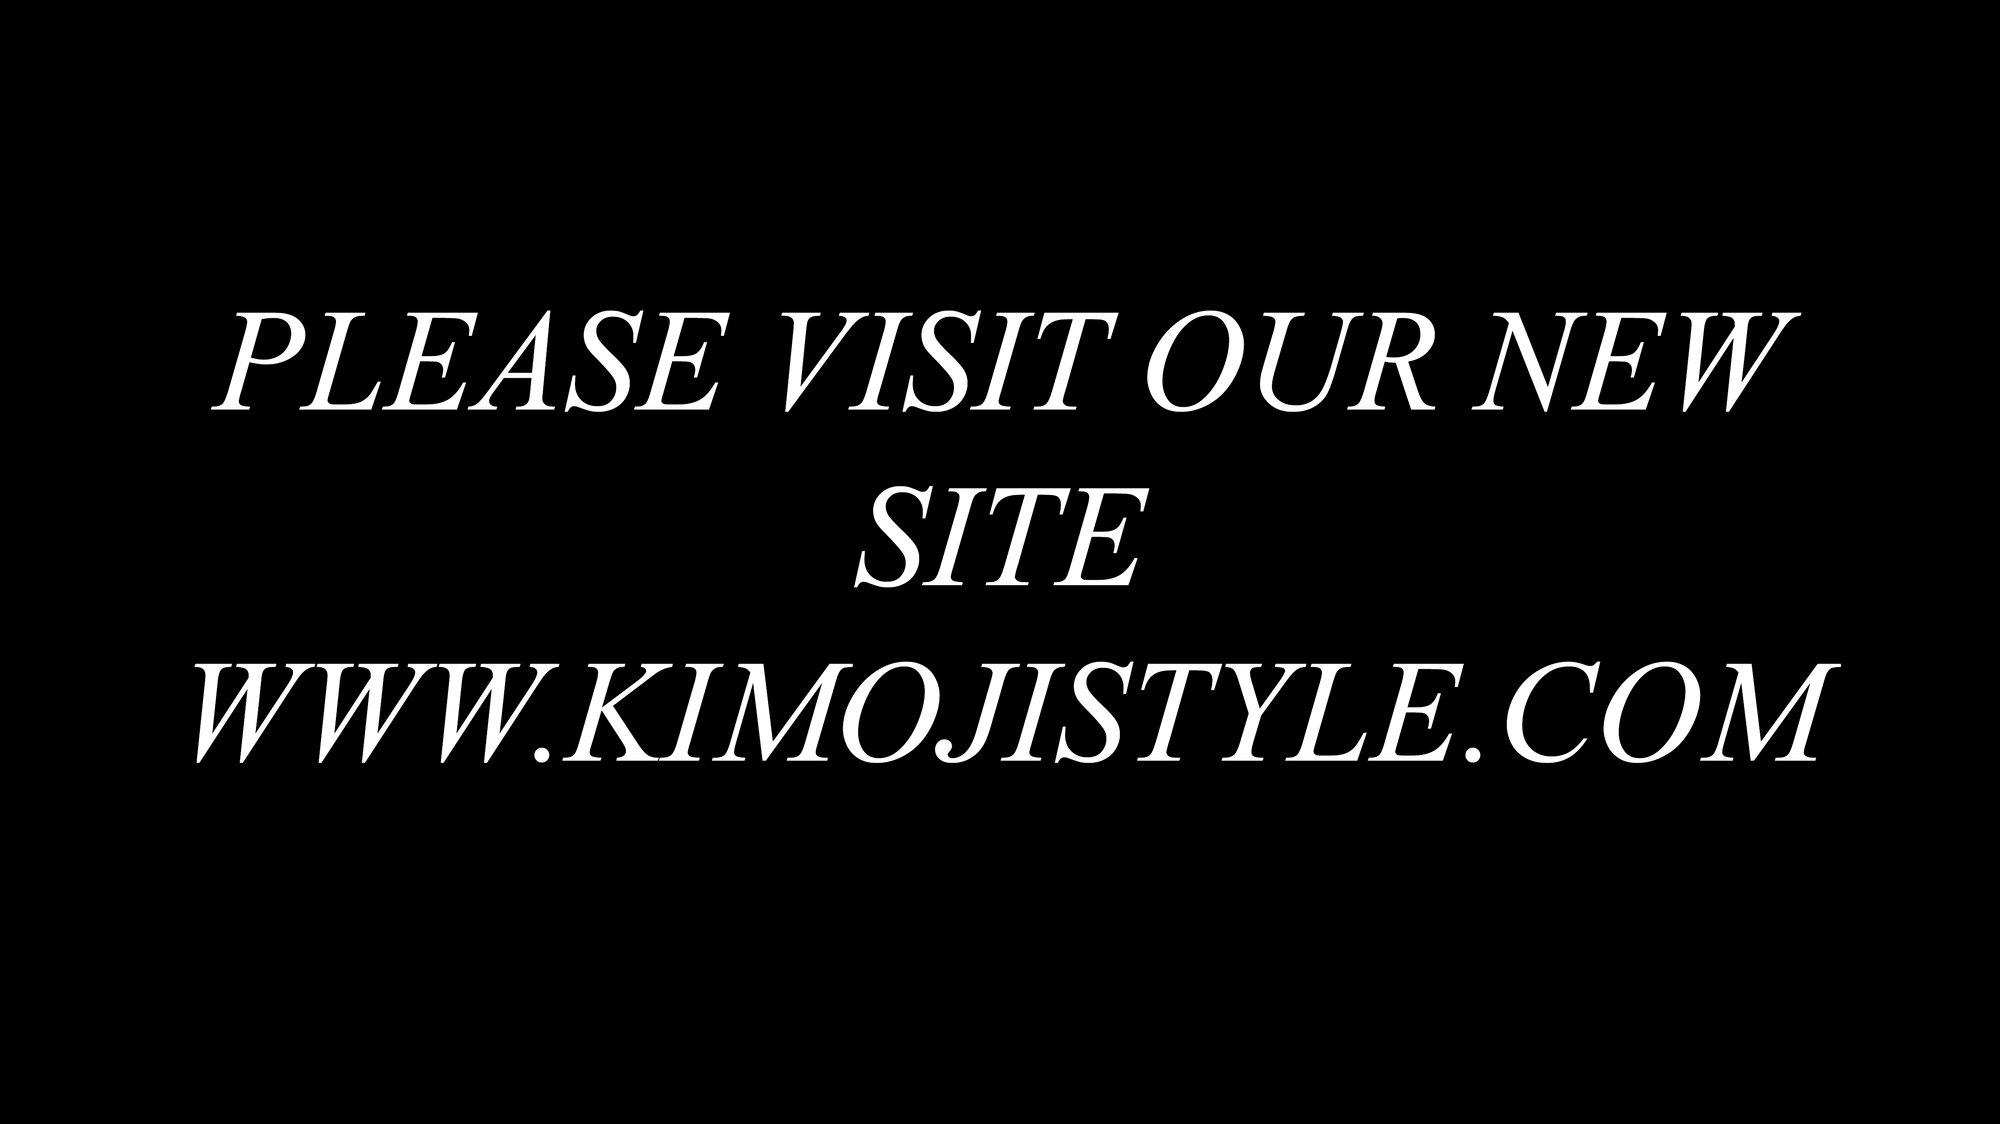 Welcome to Kimoji Style